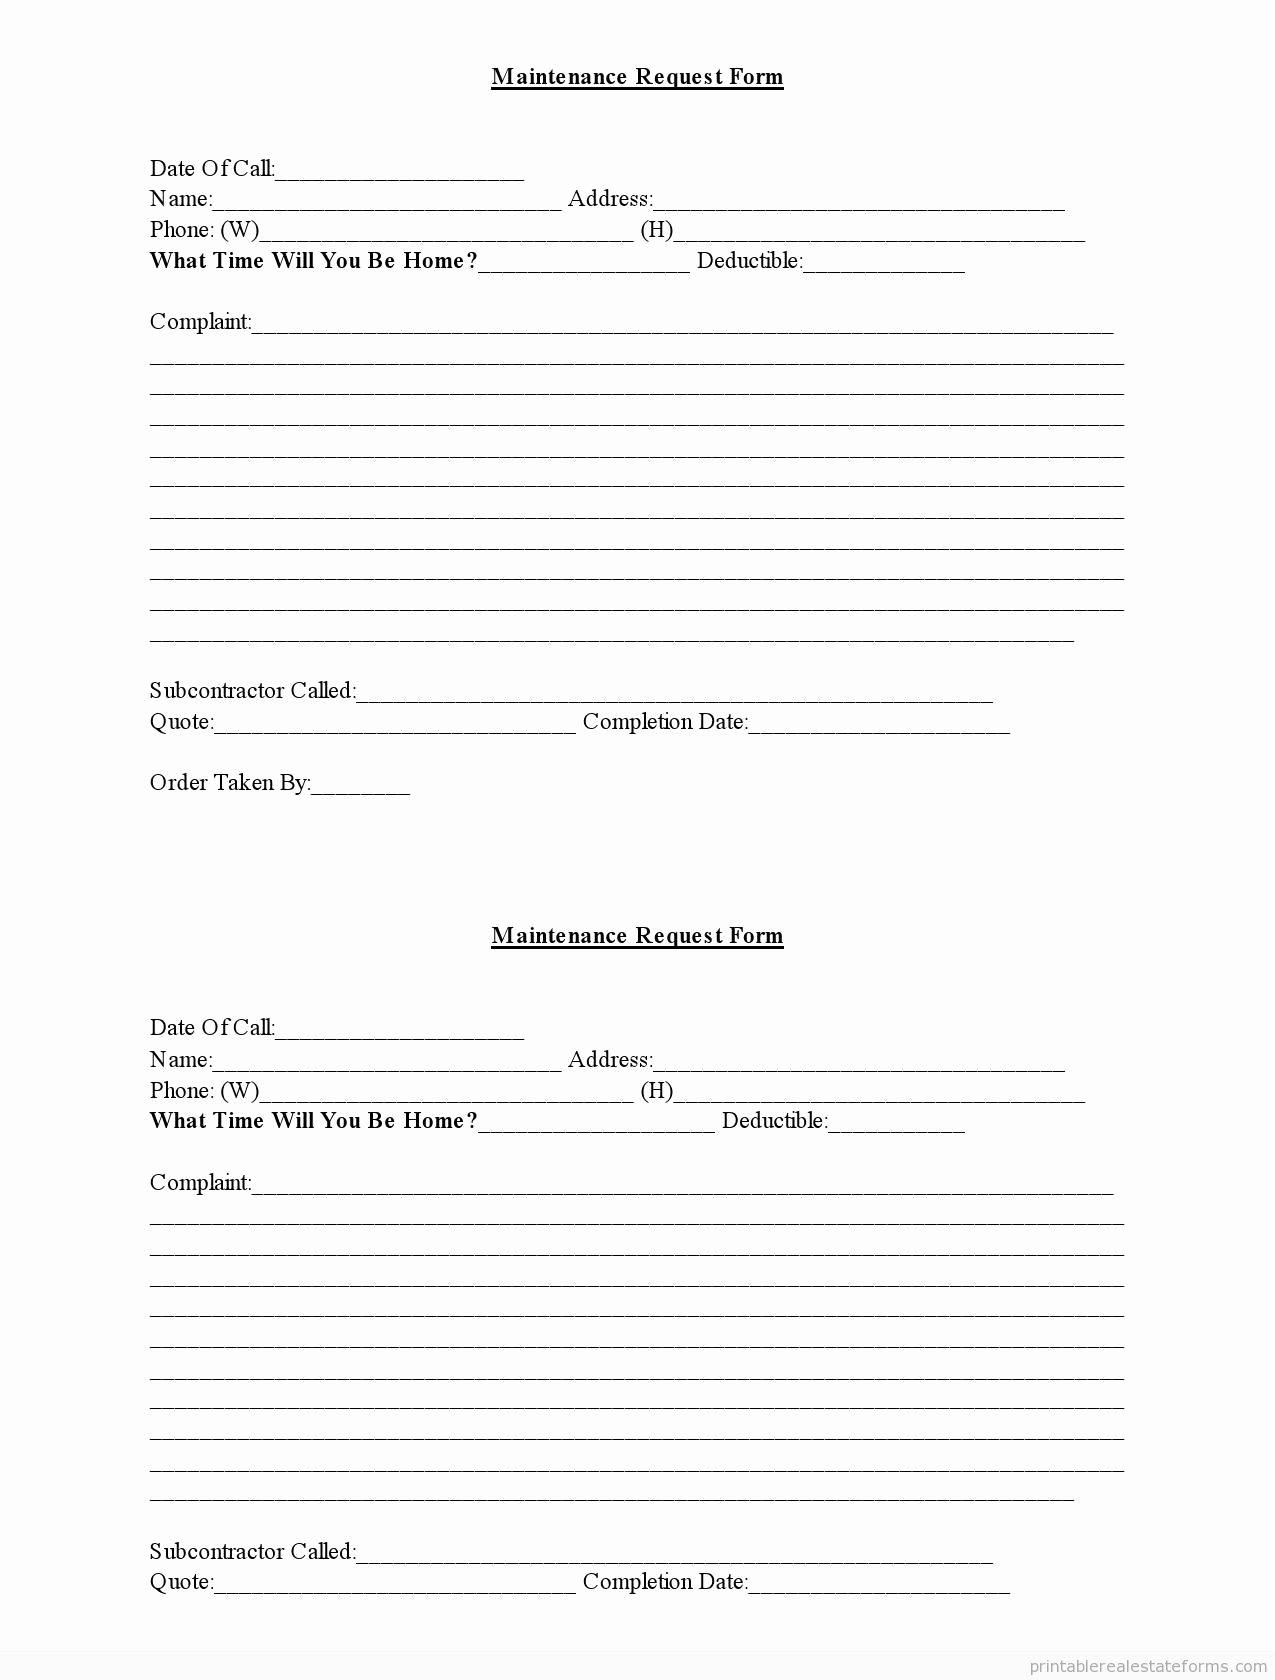 Tenant Maintenance Request form Template Fresh Maintenance Request forms Free Collectorbackuper